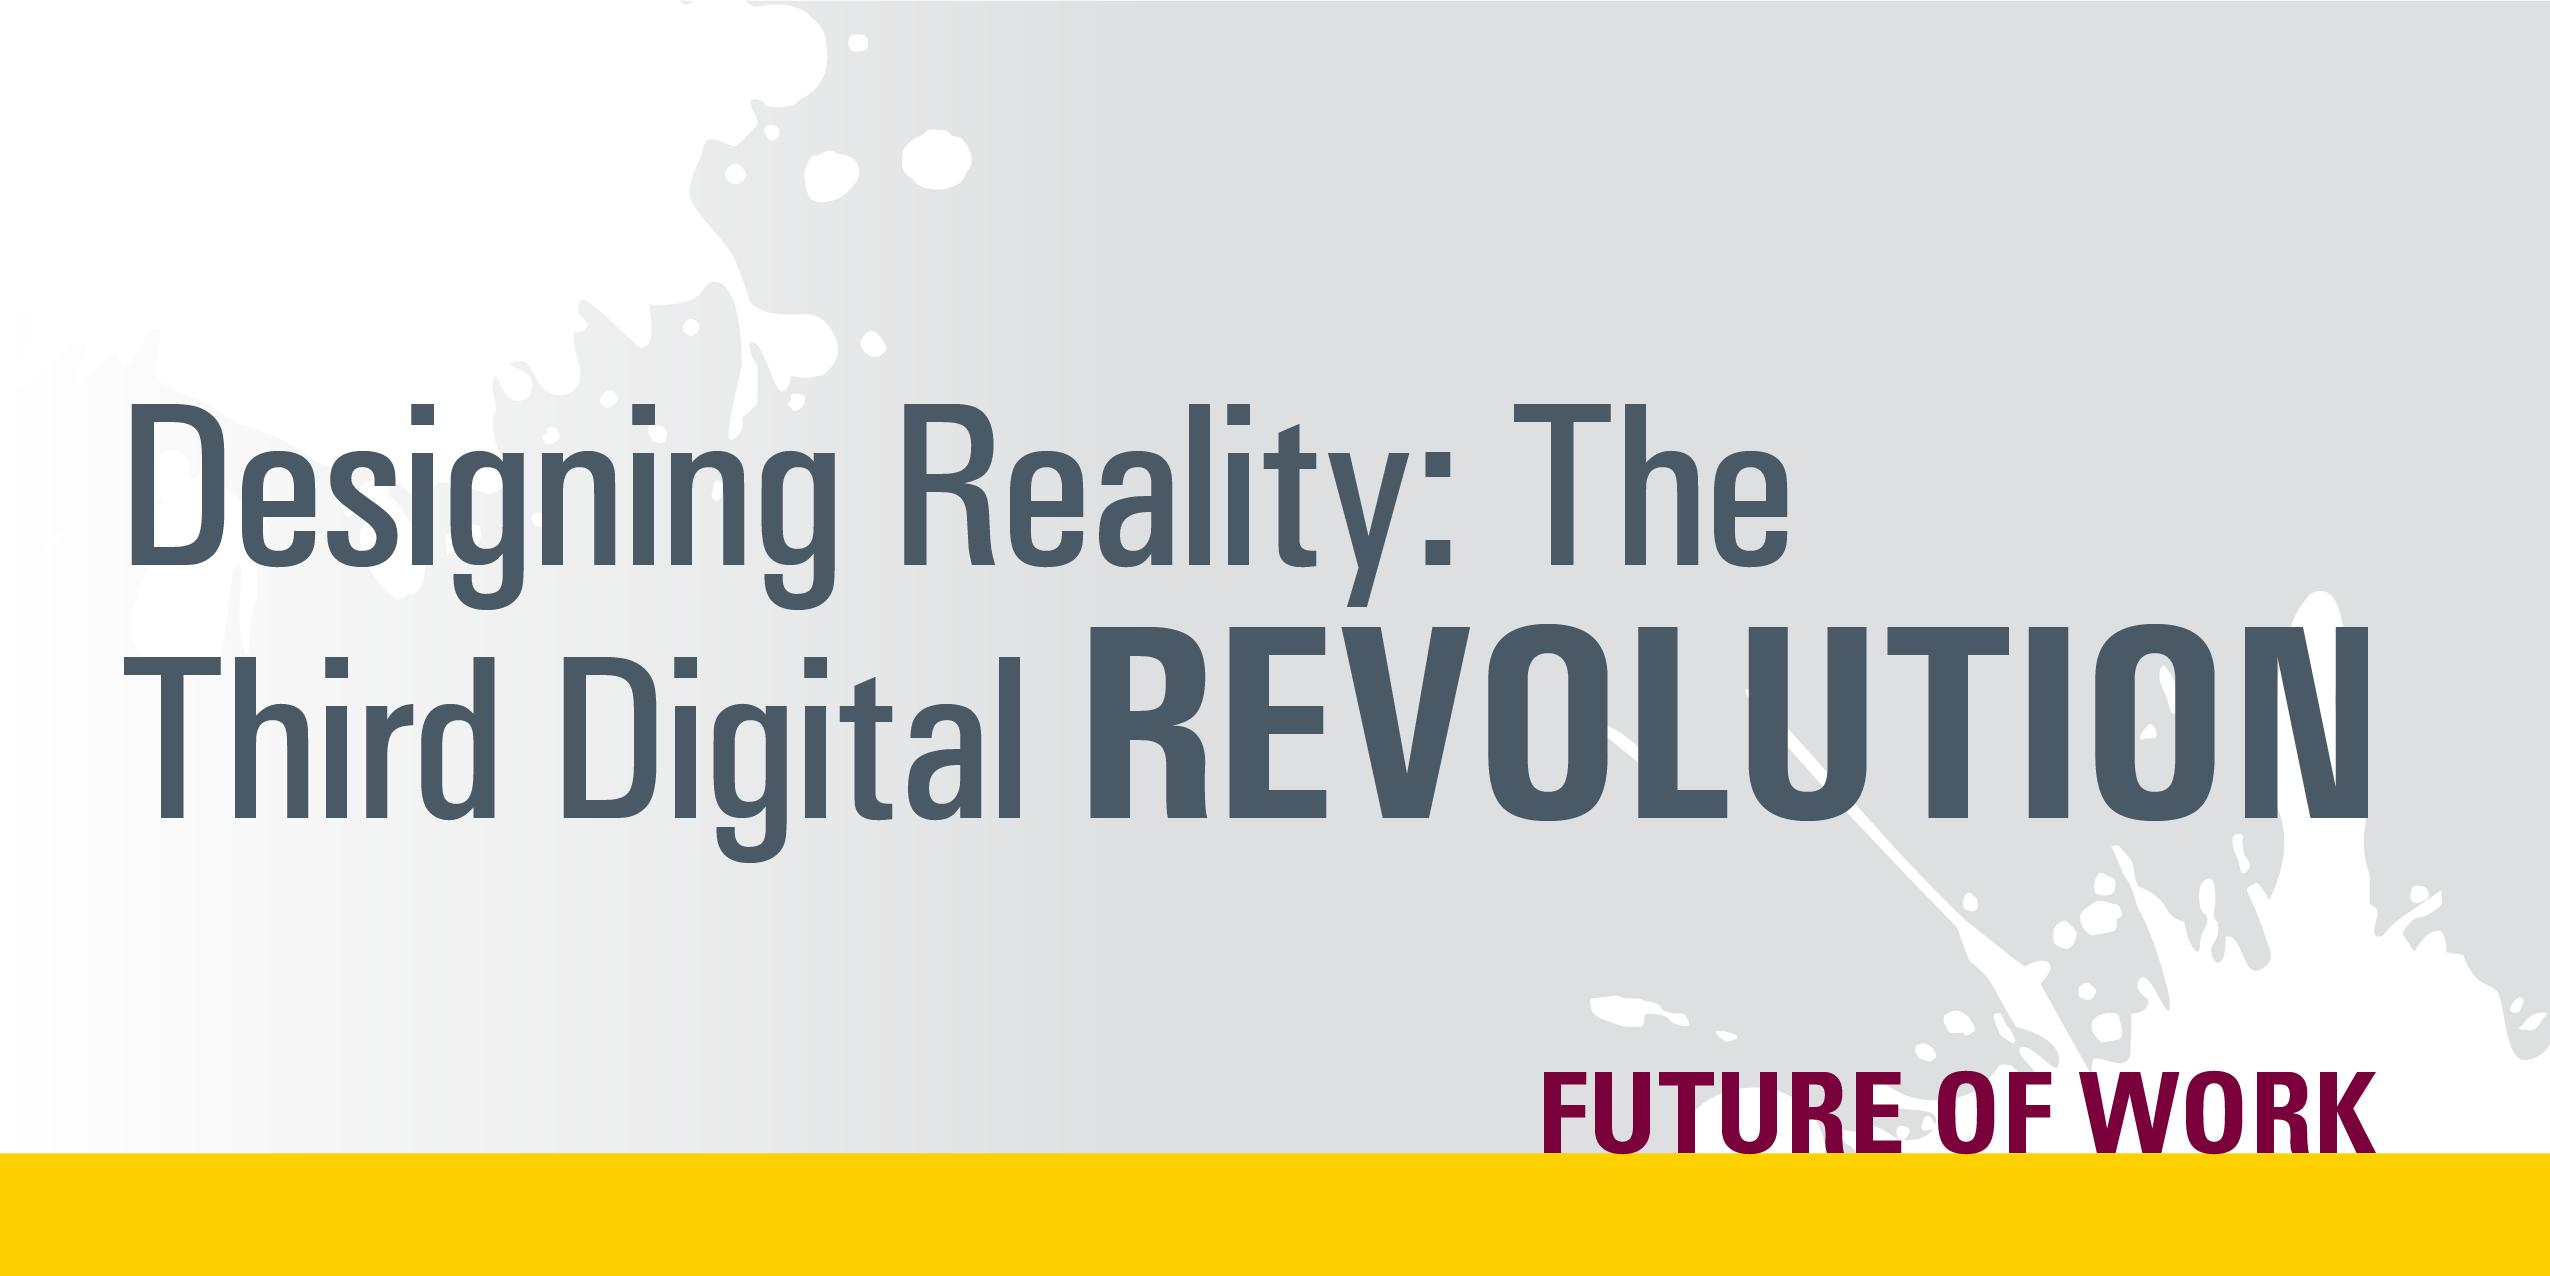 text designing reality: the third digital revolution